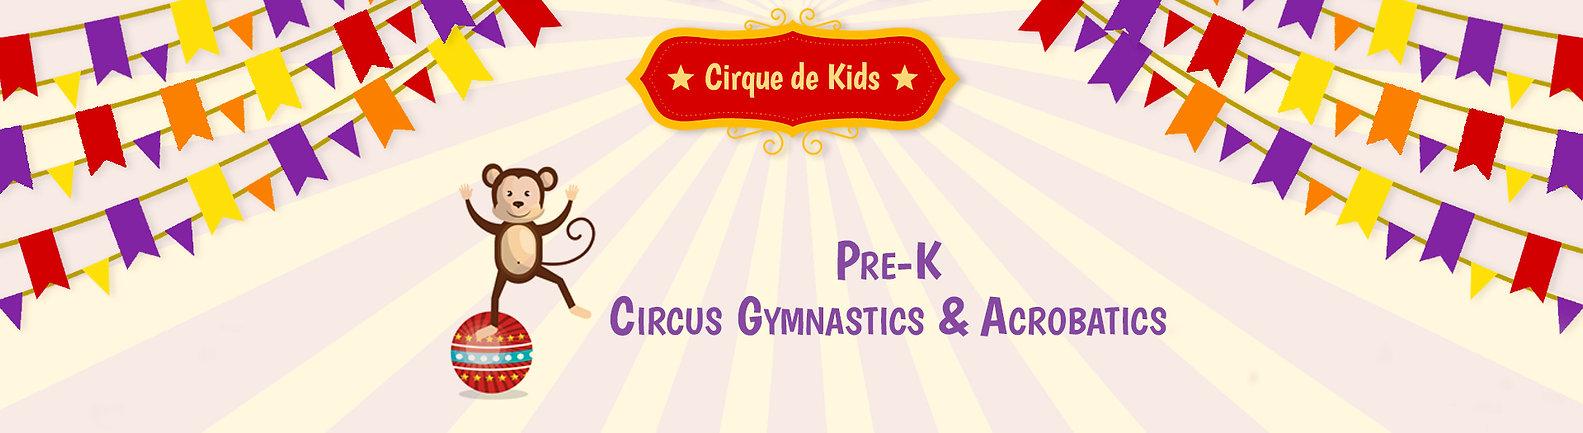 pre-k-gymnastics-acrobatics-2.jpeg